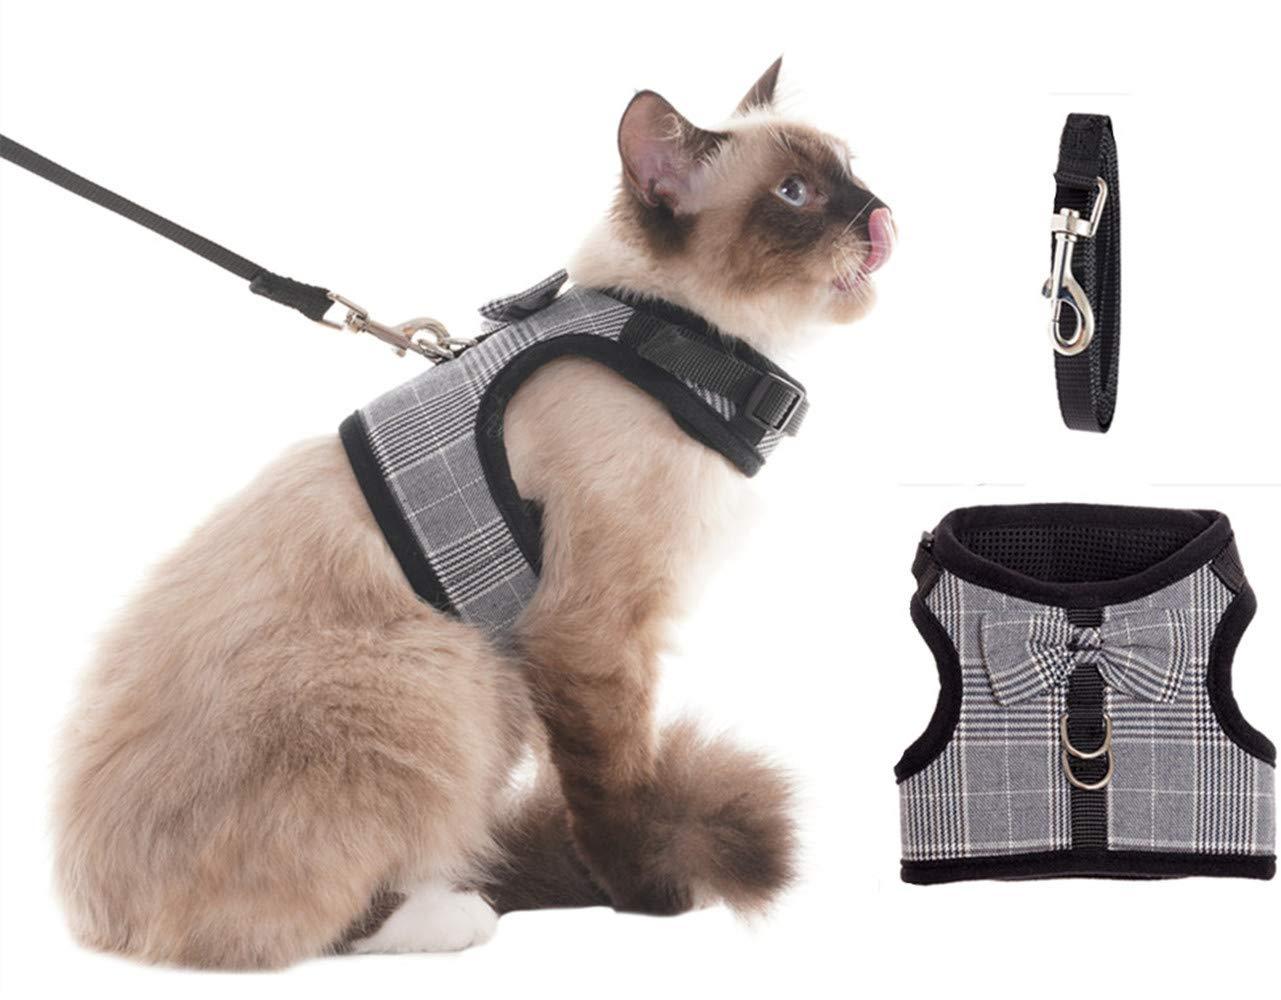 BINGPET Escape Proof Cat Harness - Adjustable Vest and Leash Set